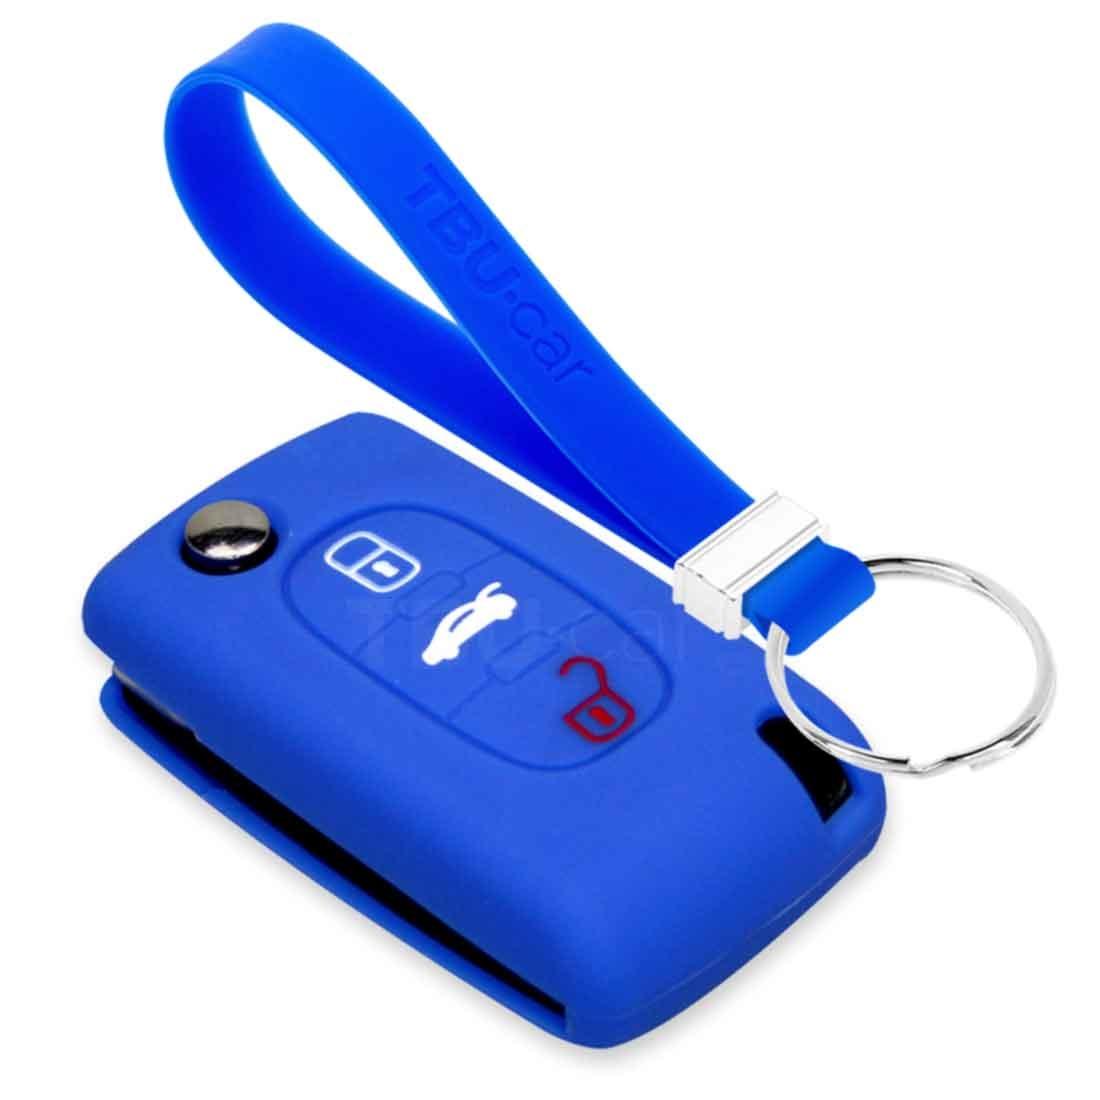 TBU car TBU car Funda Carcasa llave compatible con Citroën - Funda de Silicona - Cover de Llave Coche - Azul